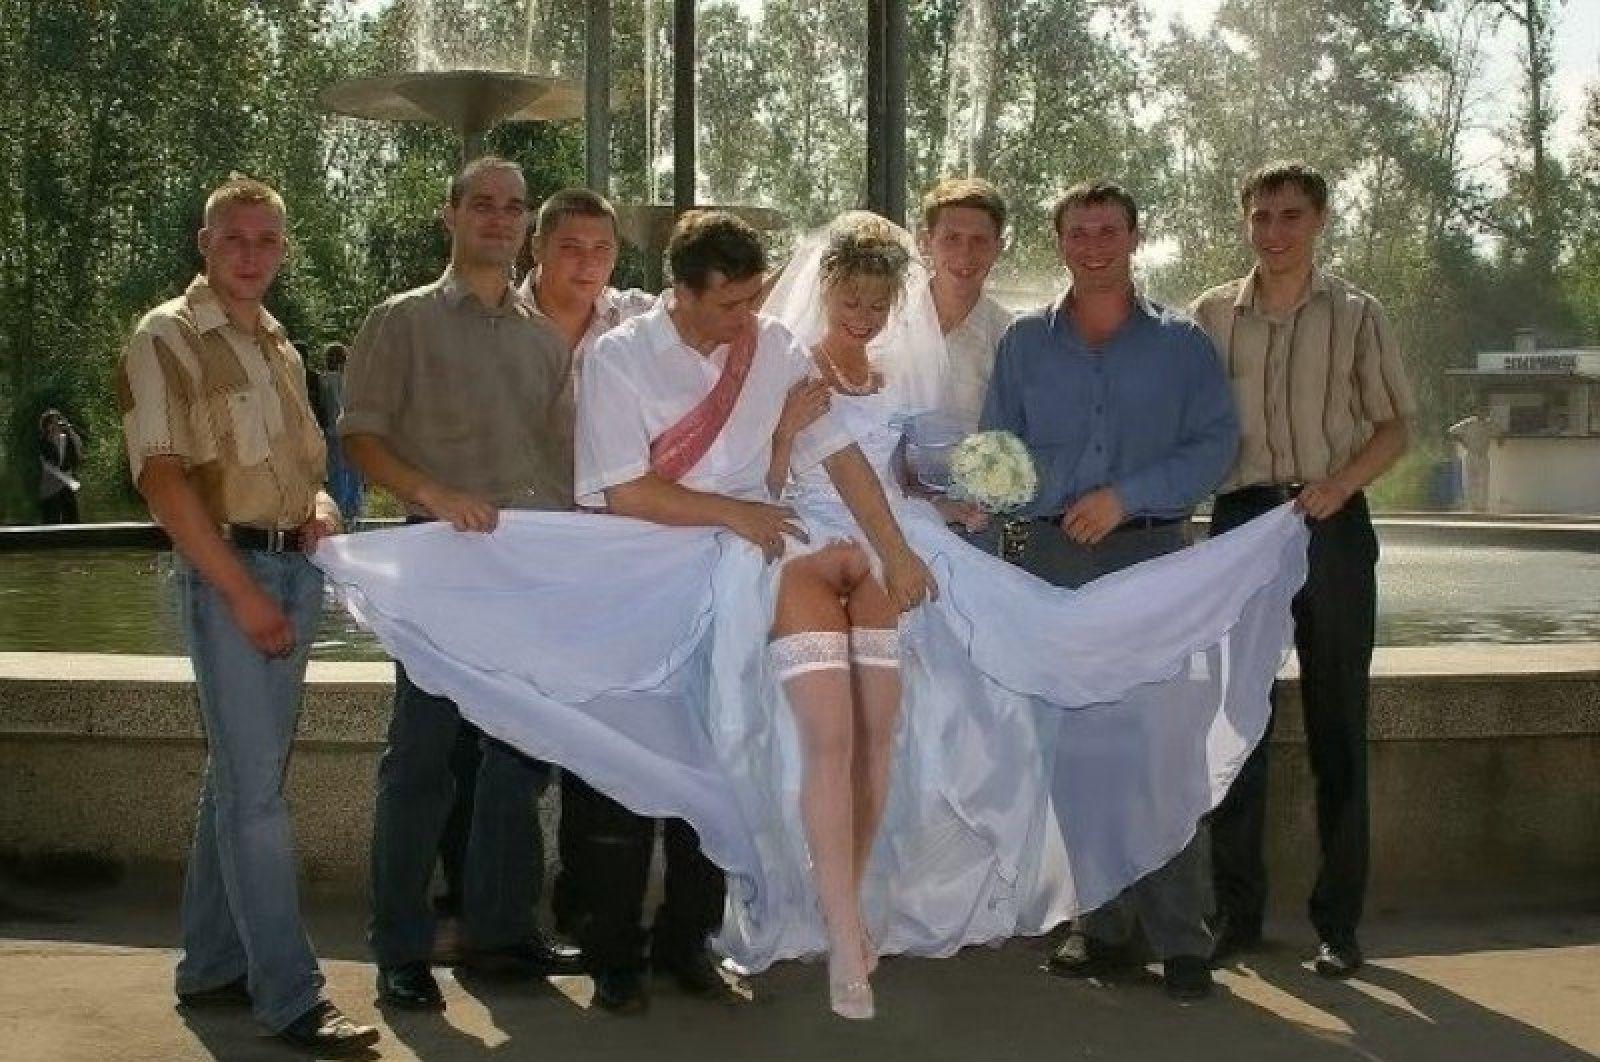 невеста без трусов на свадьбе - 8